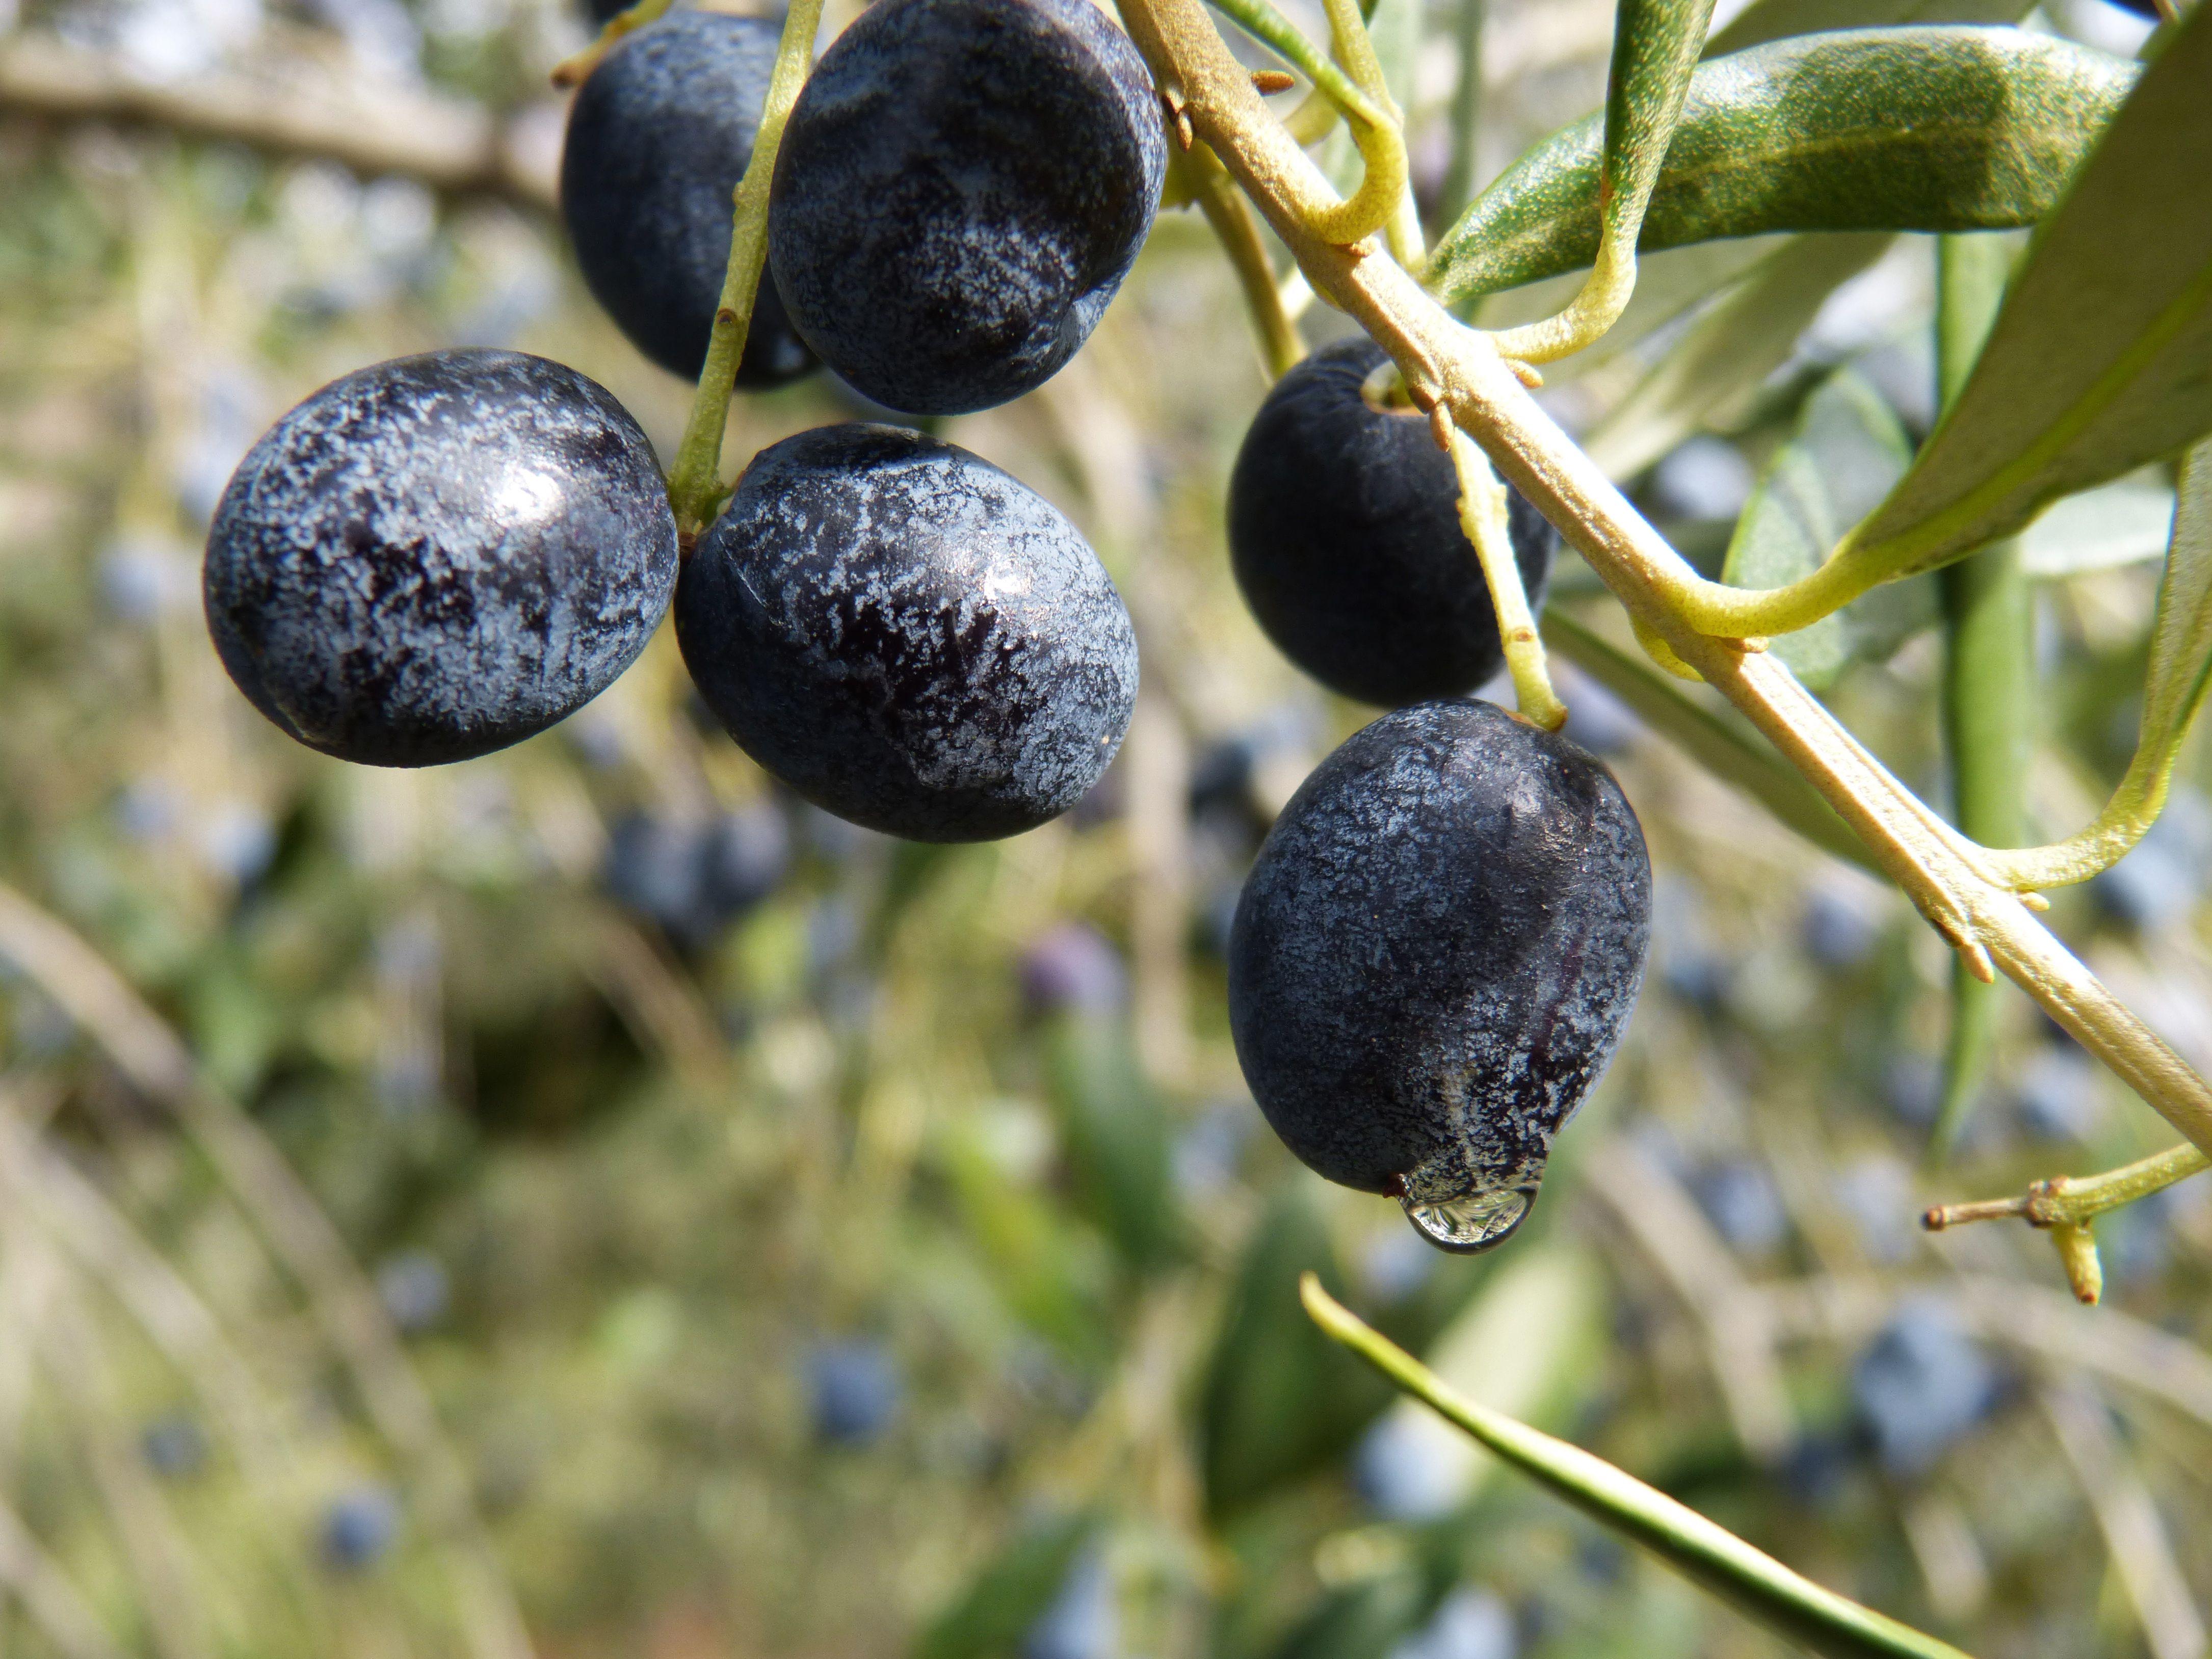 Ripe black Niçoise olives on a branch